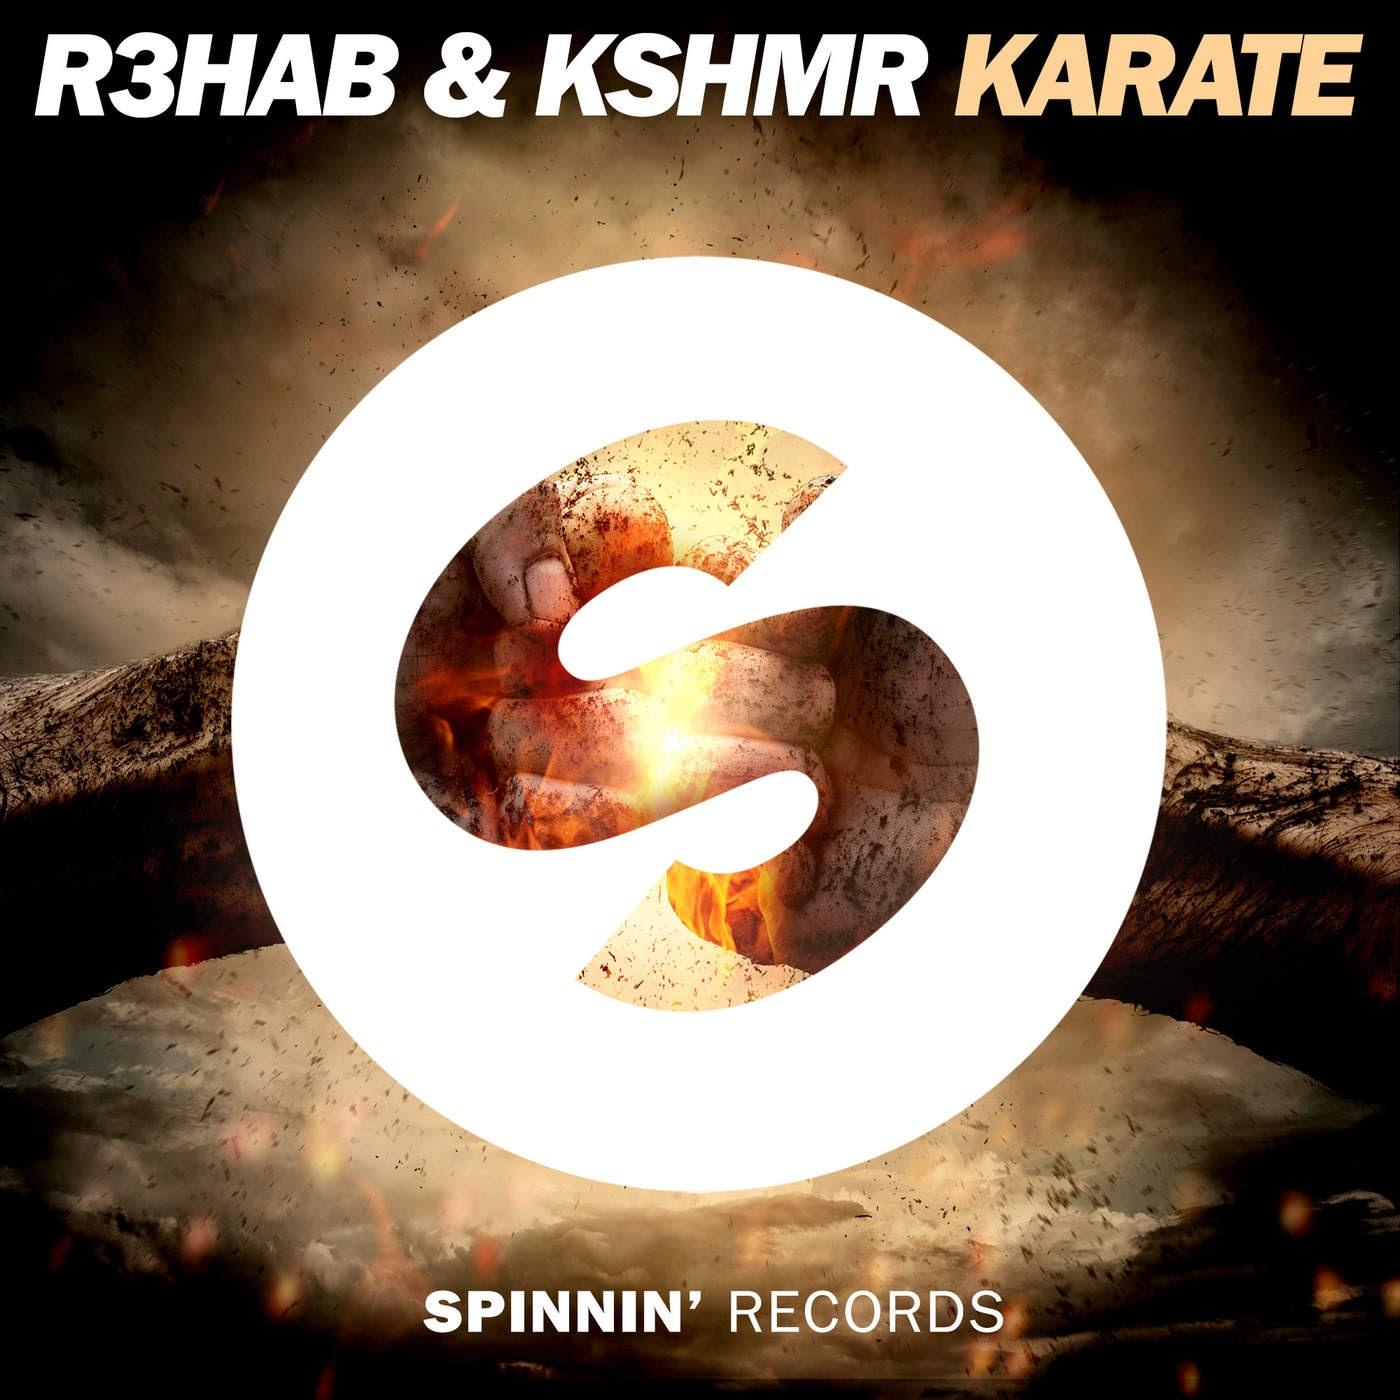 R3hab & KSHMR - Karate - Single  Cover